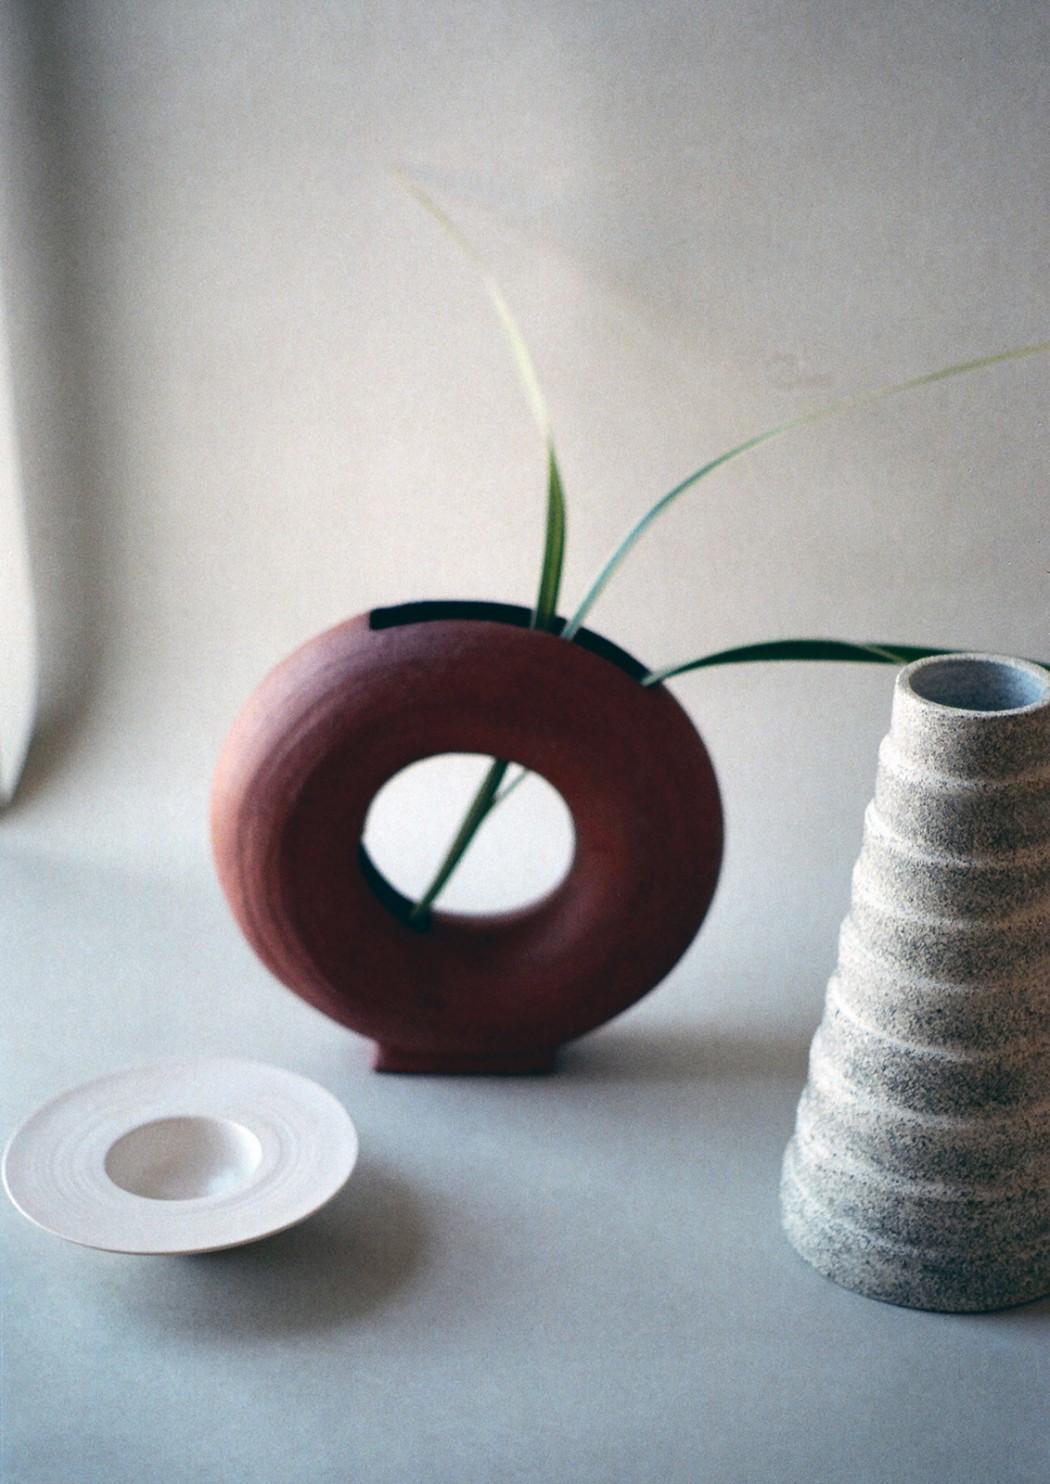 Design-Natalie-Weinberger-Ceramics-6-1050x1484